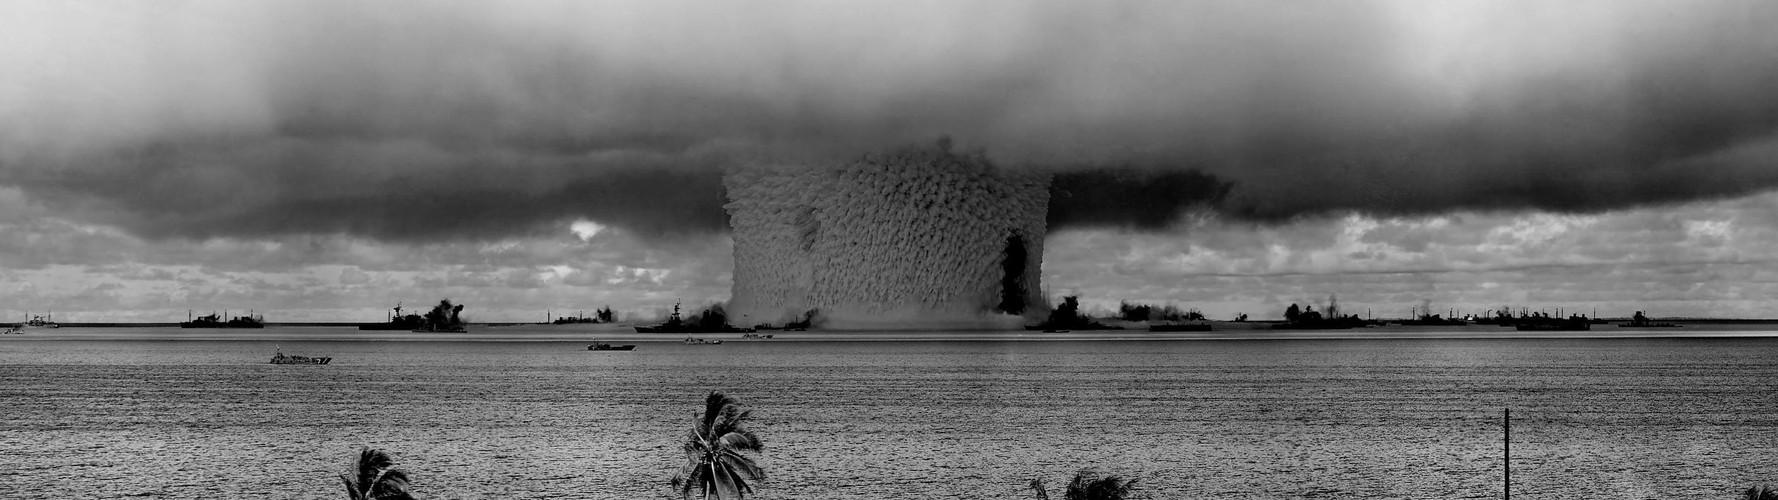 Zerstörung_Natur2.jpg